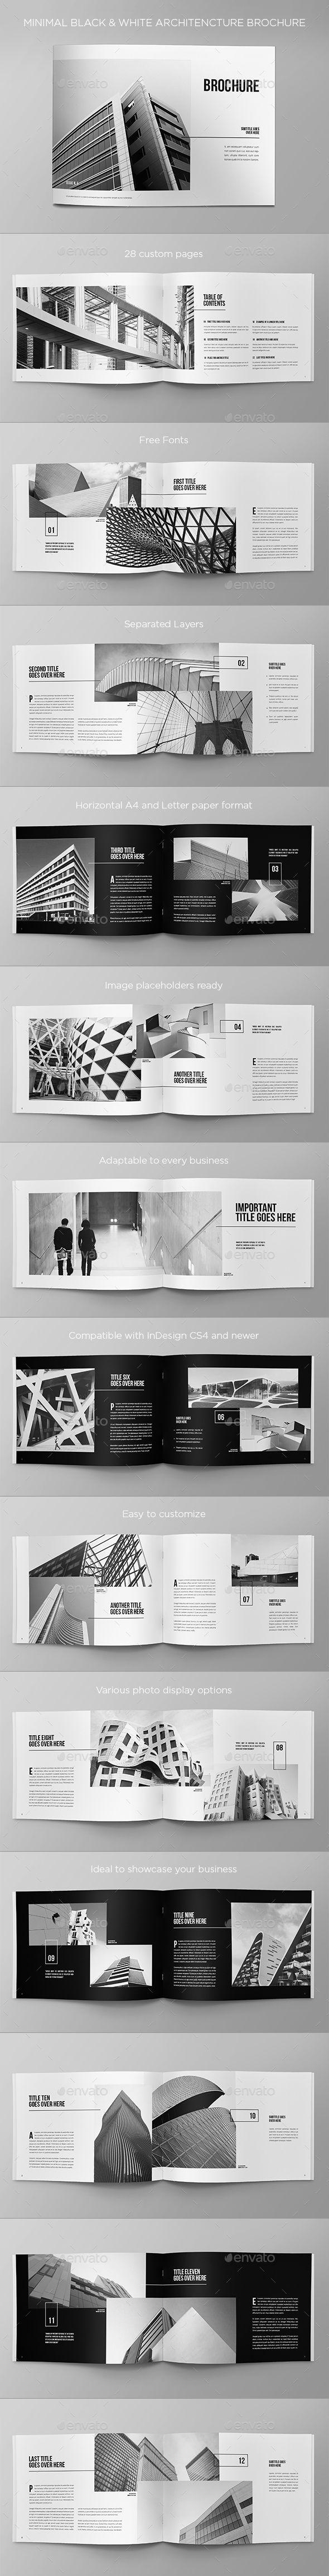 Minimal Black & White Architecture Brochure - Brochures Print Templates